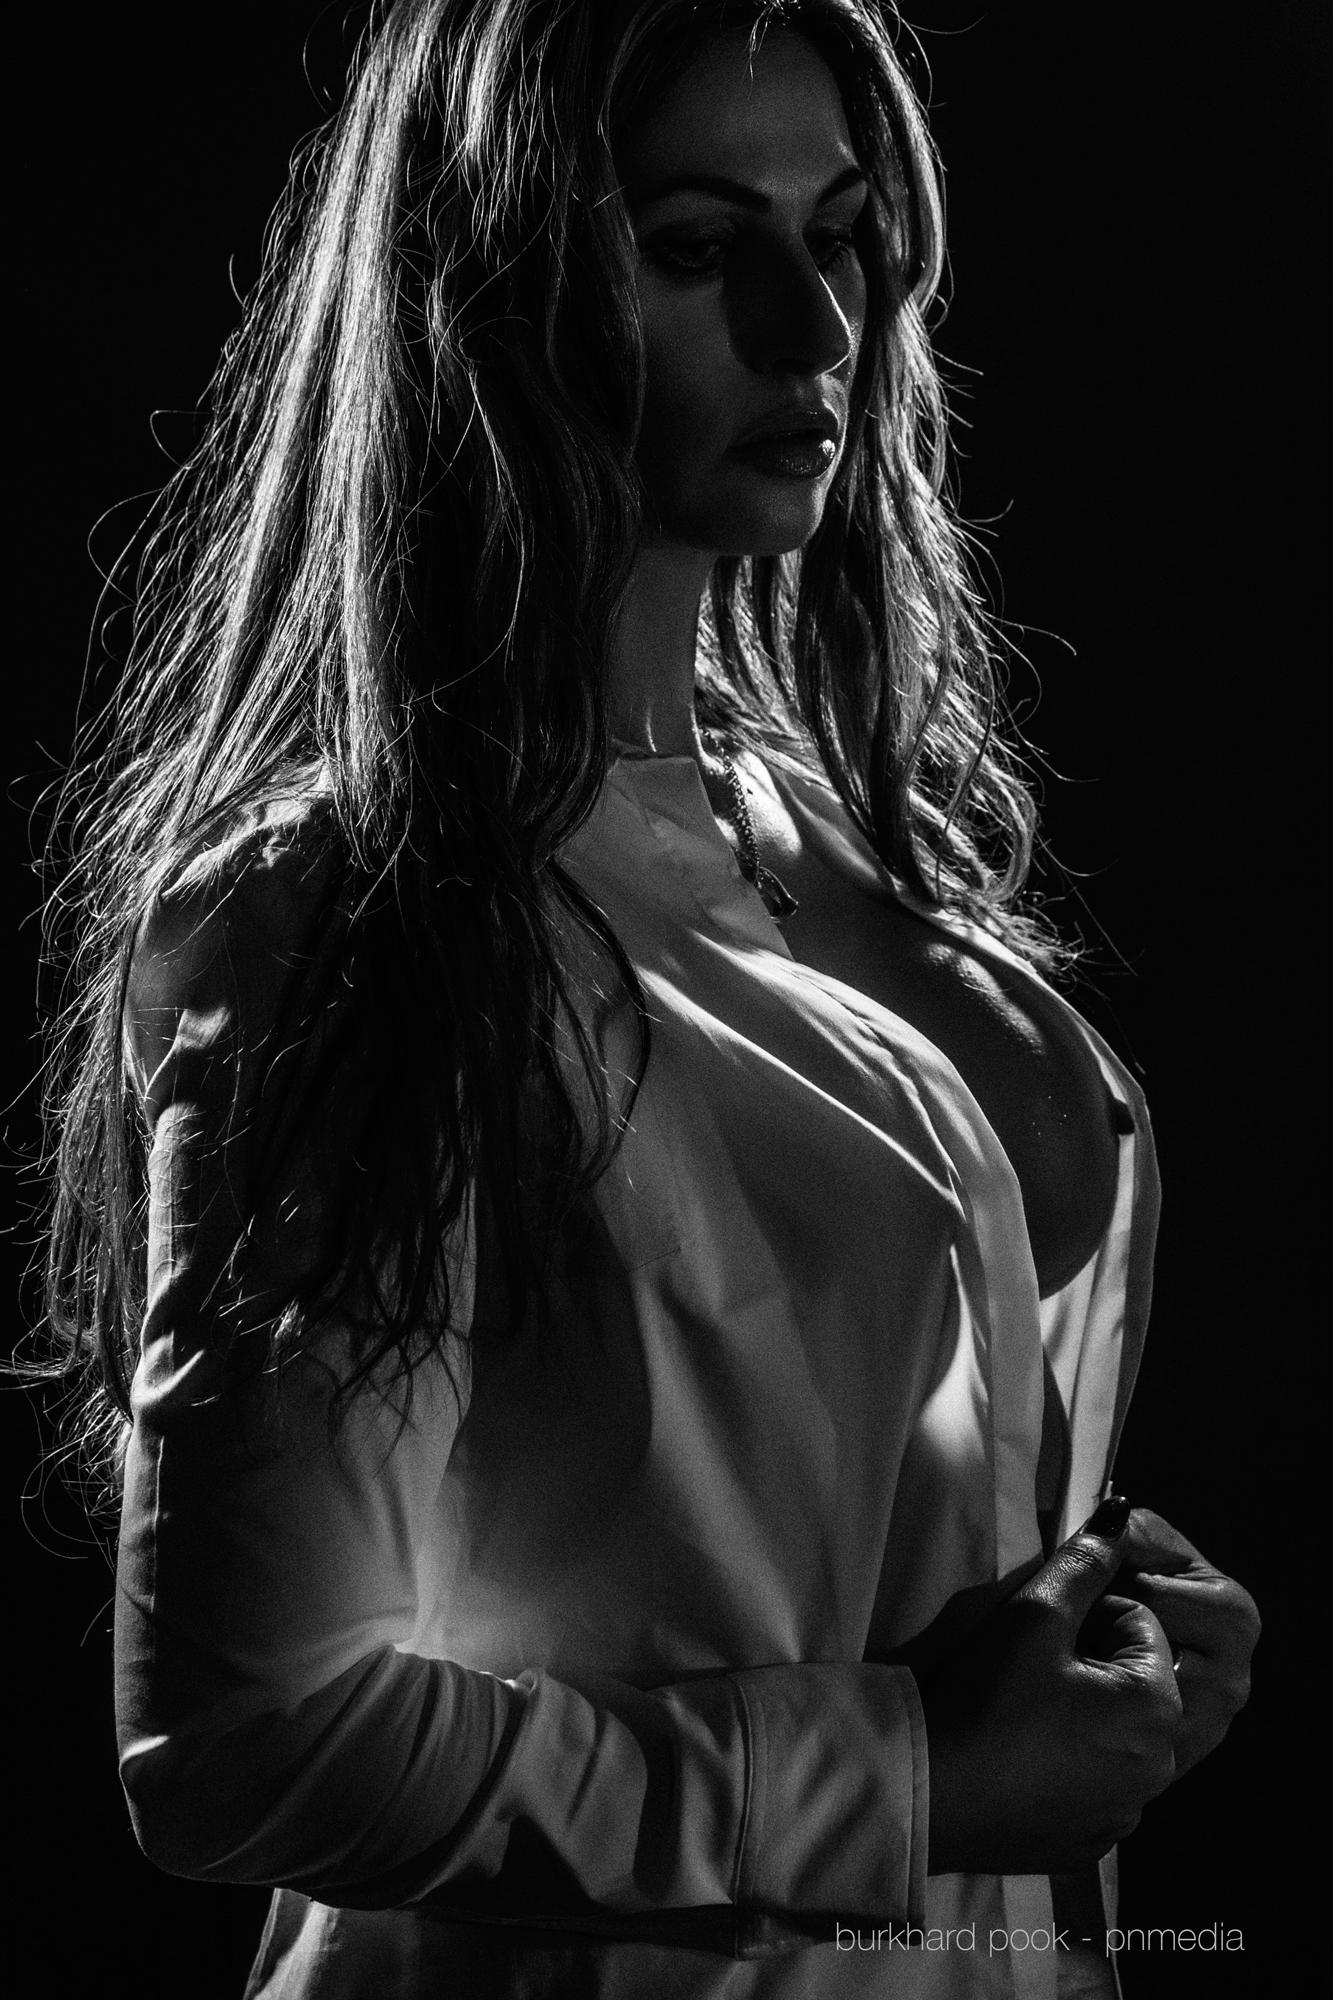 Девушки-2016 Girls 2016 by Burkhard Pook